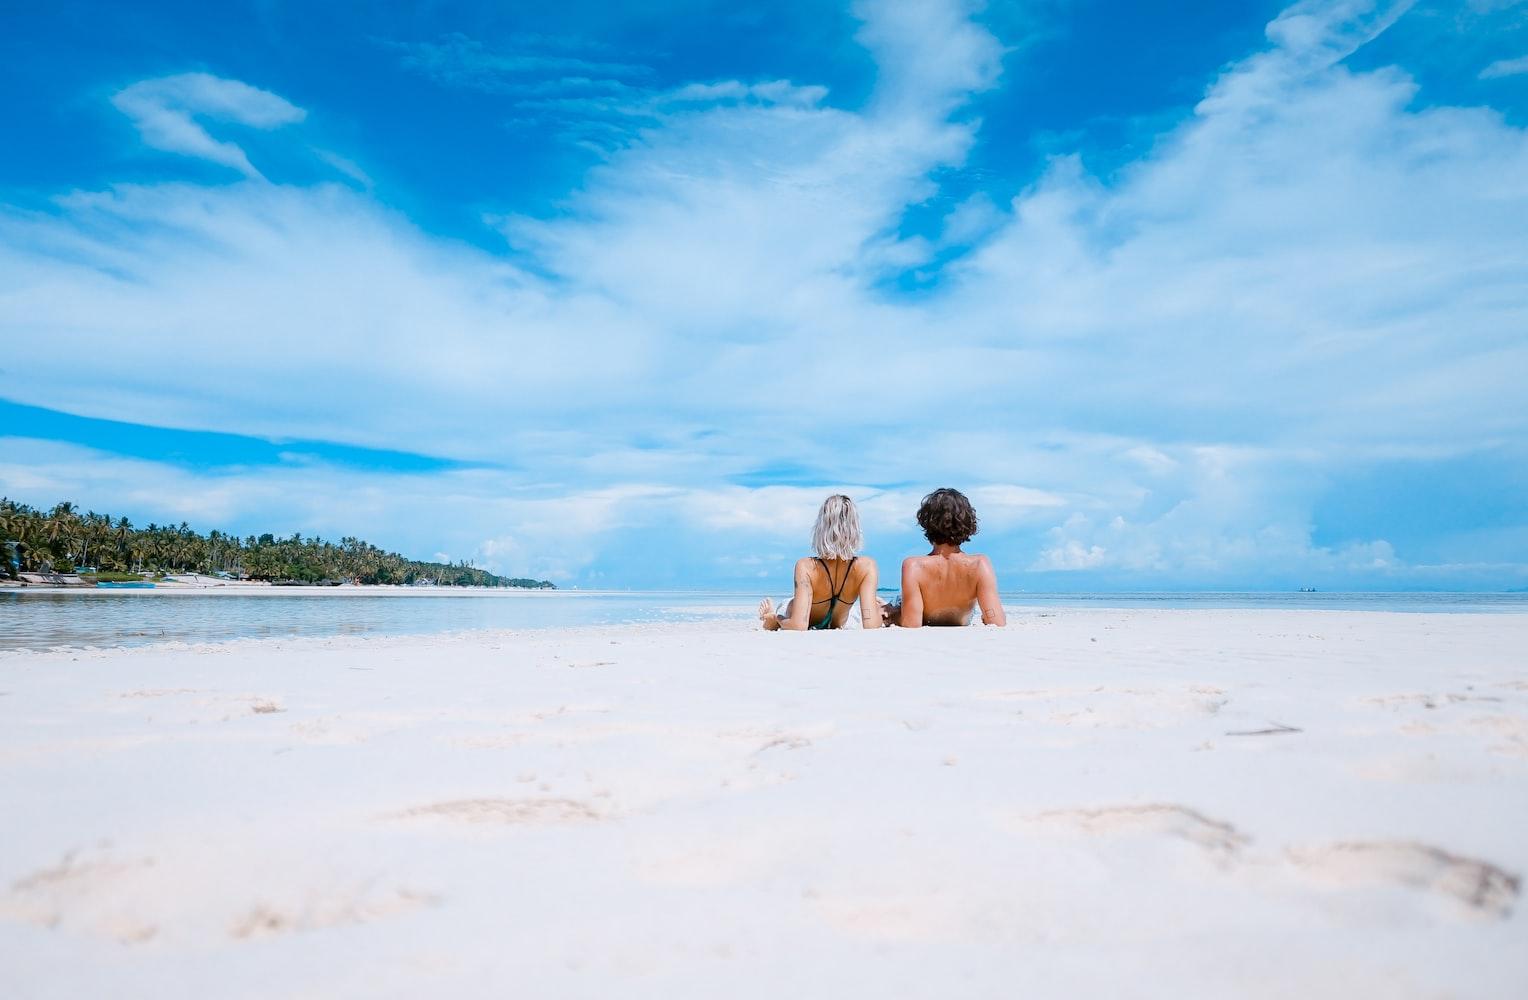 A couple in beach